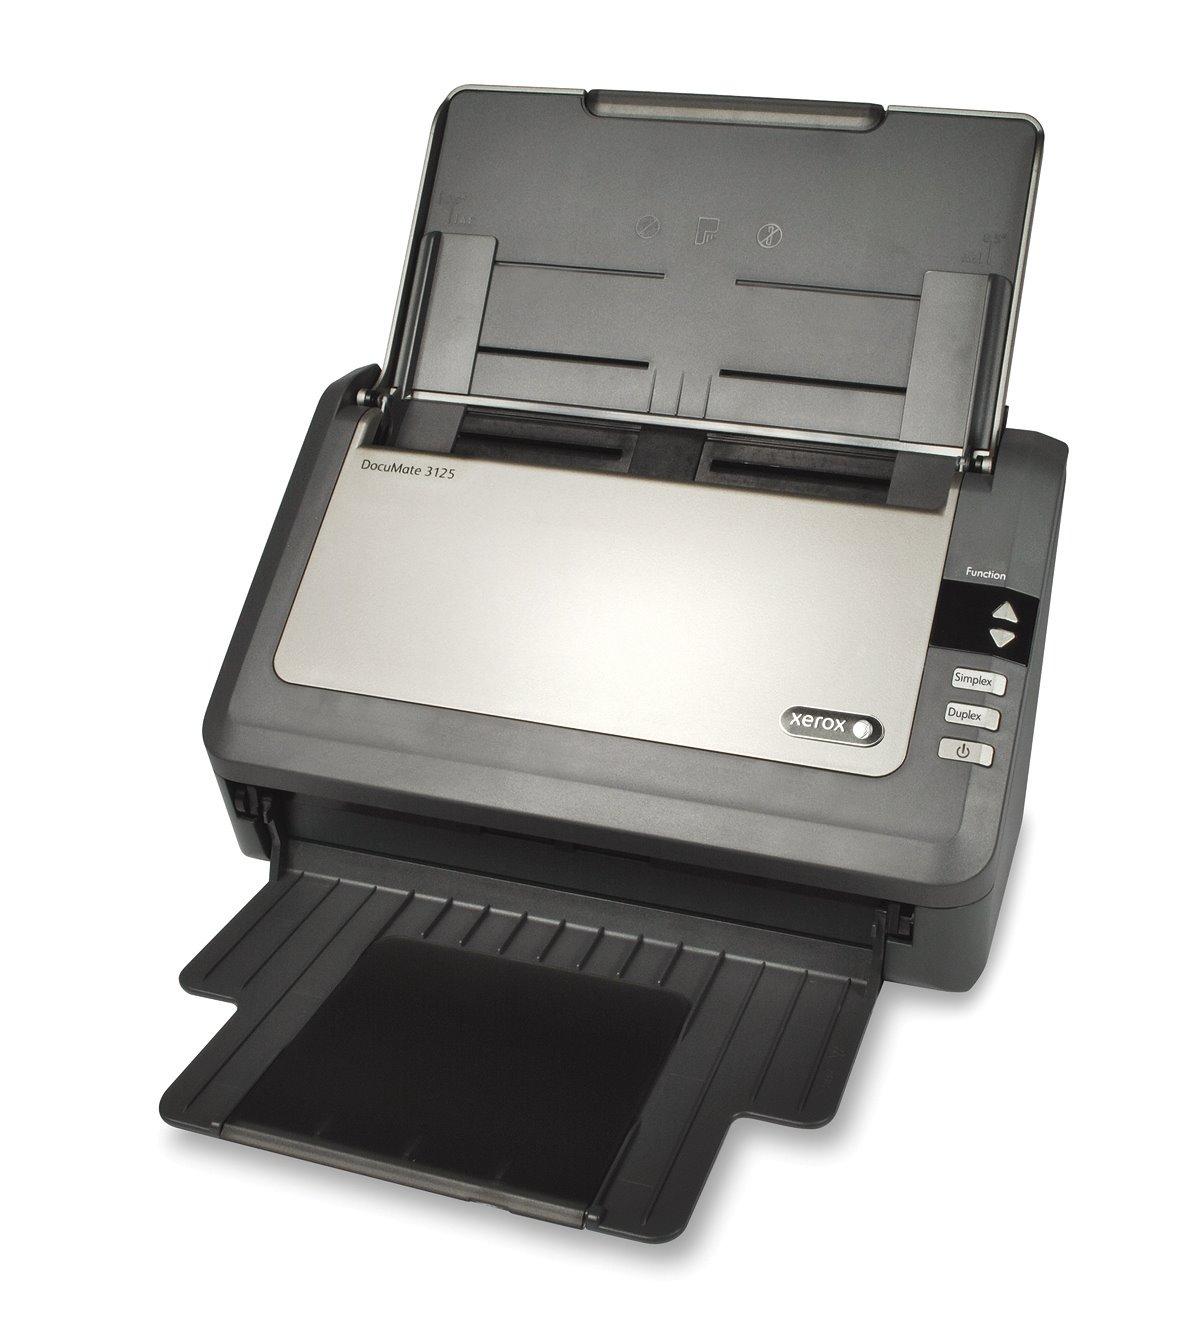 Fuji Xerox DocuMate 3125 Sheetfed Scanner - 600 dpi Optical